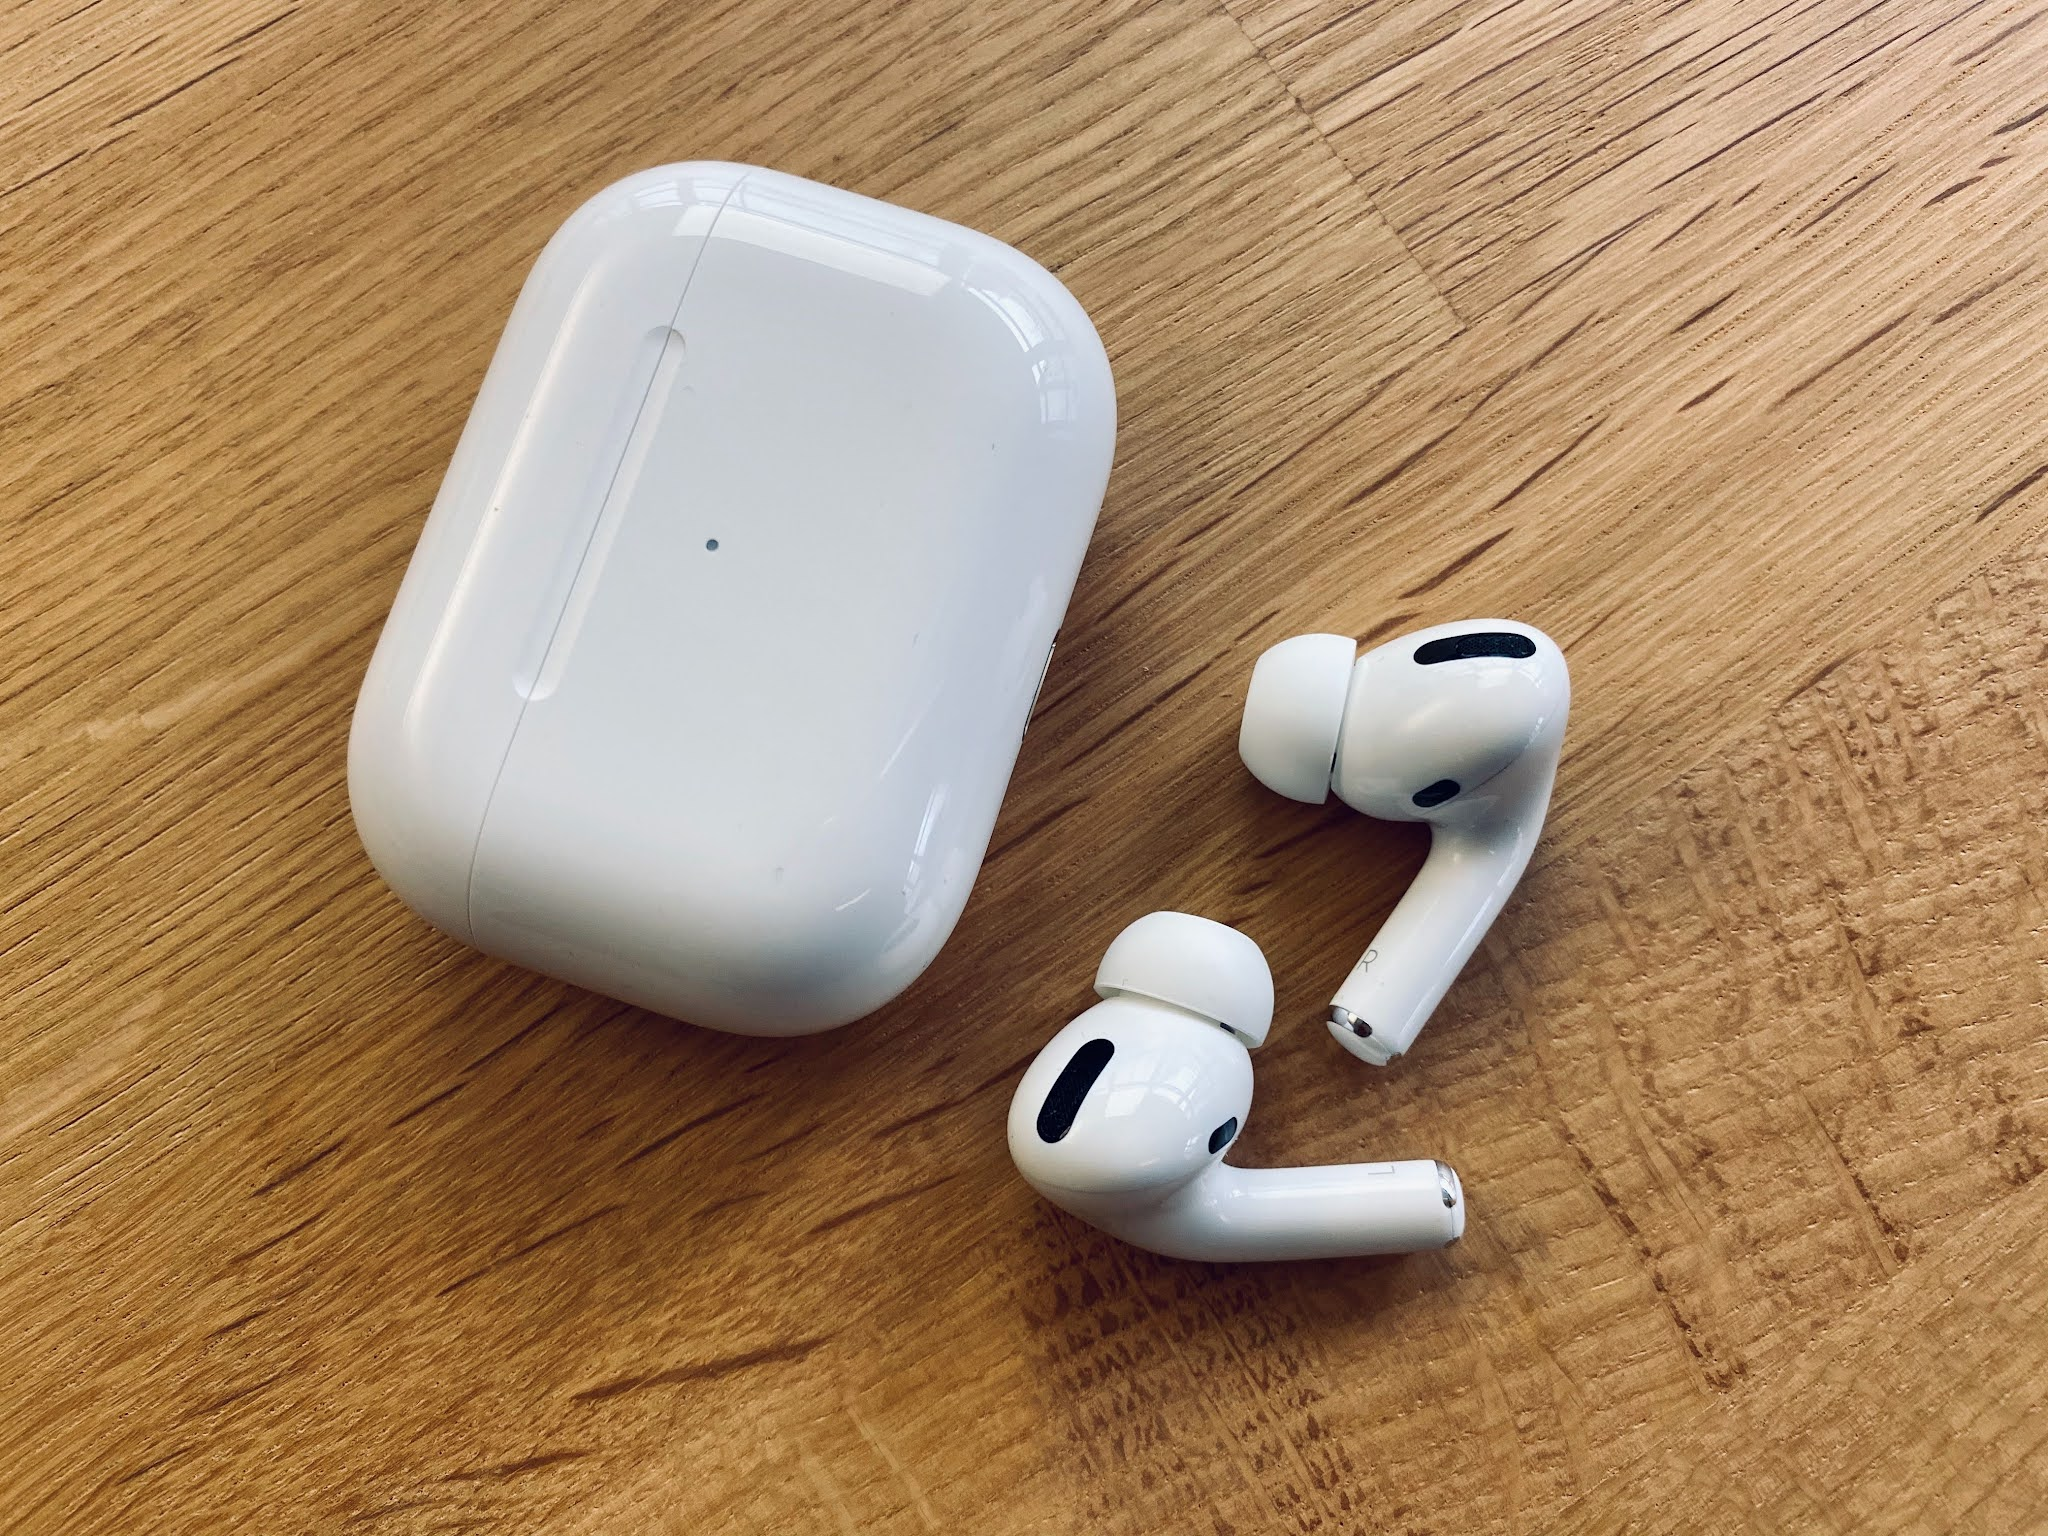 Apple AirPods Pro - Best true wireless earbuds for 2021